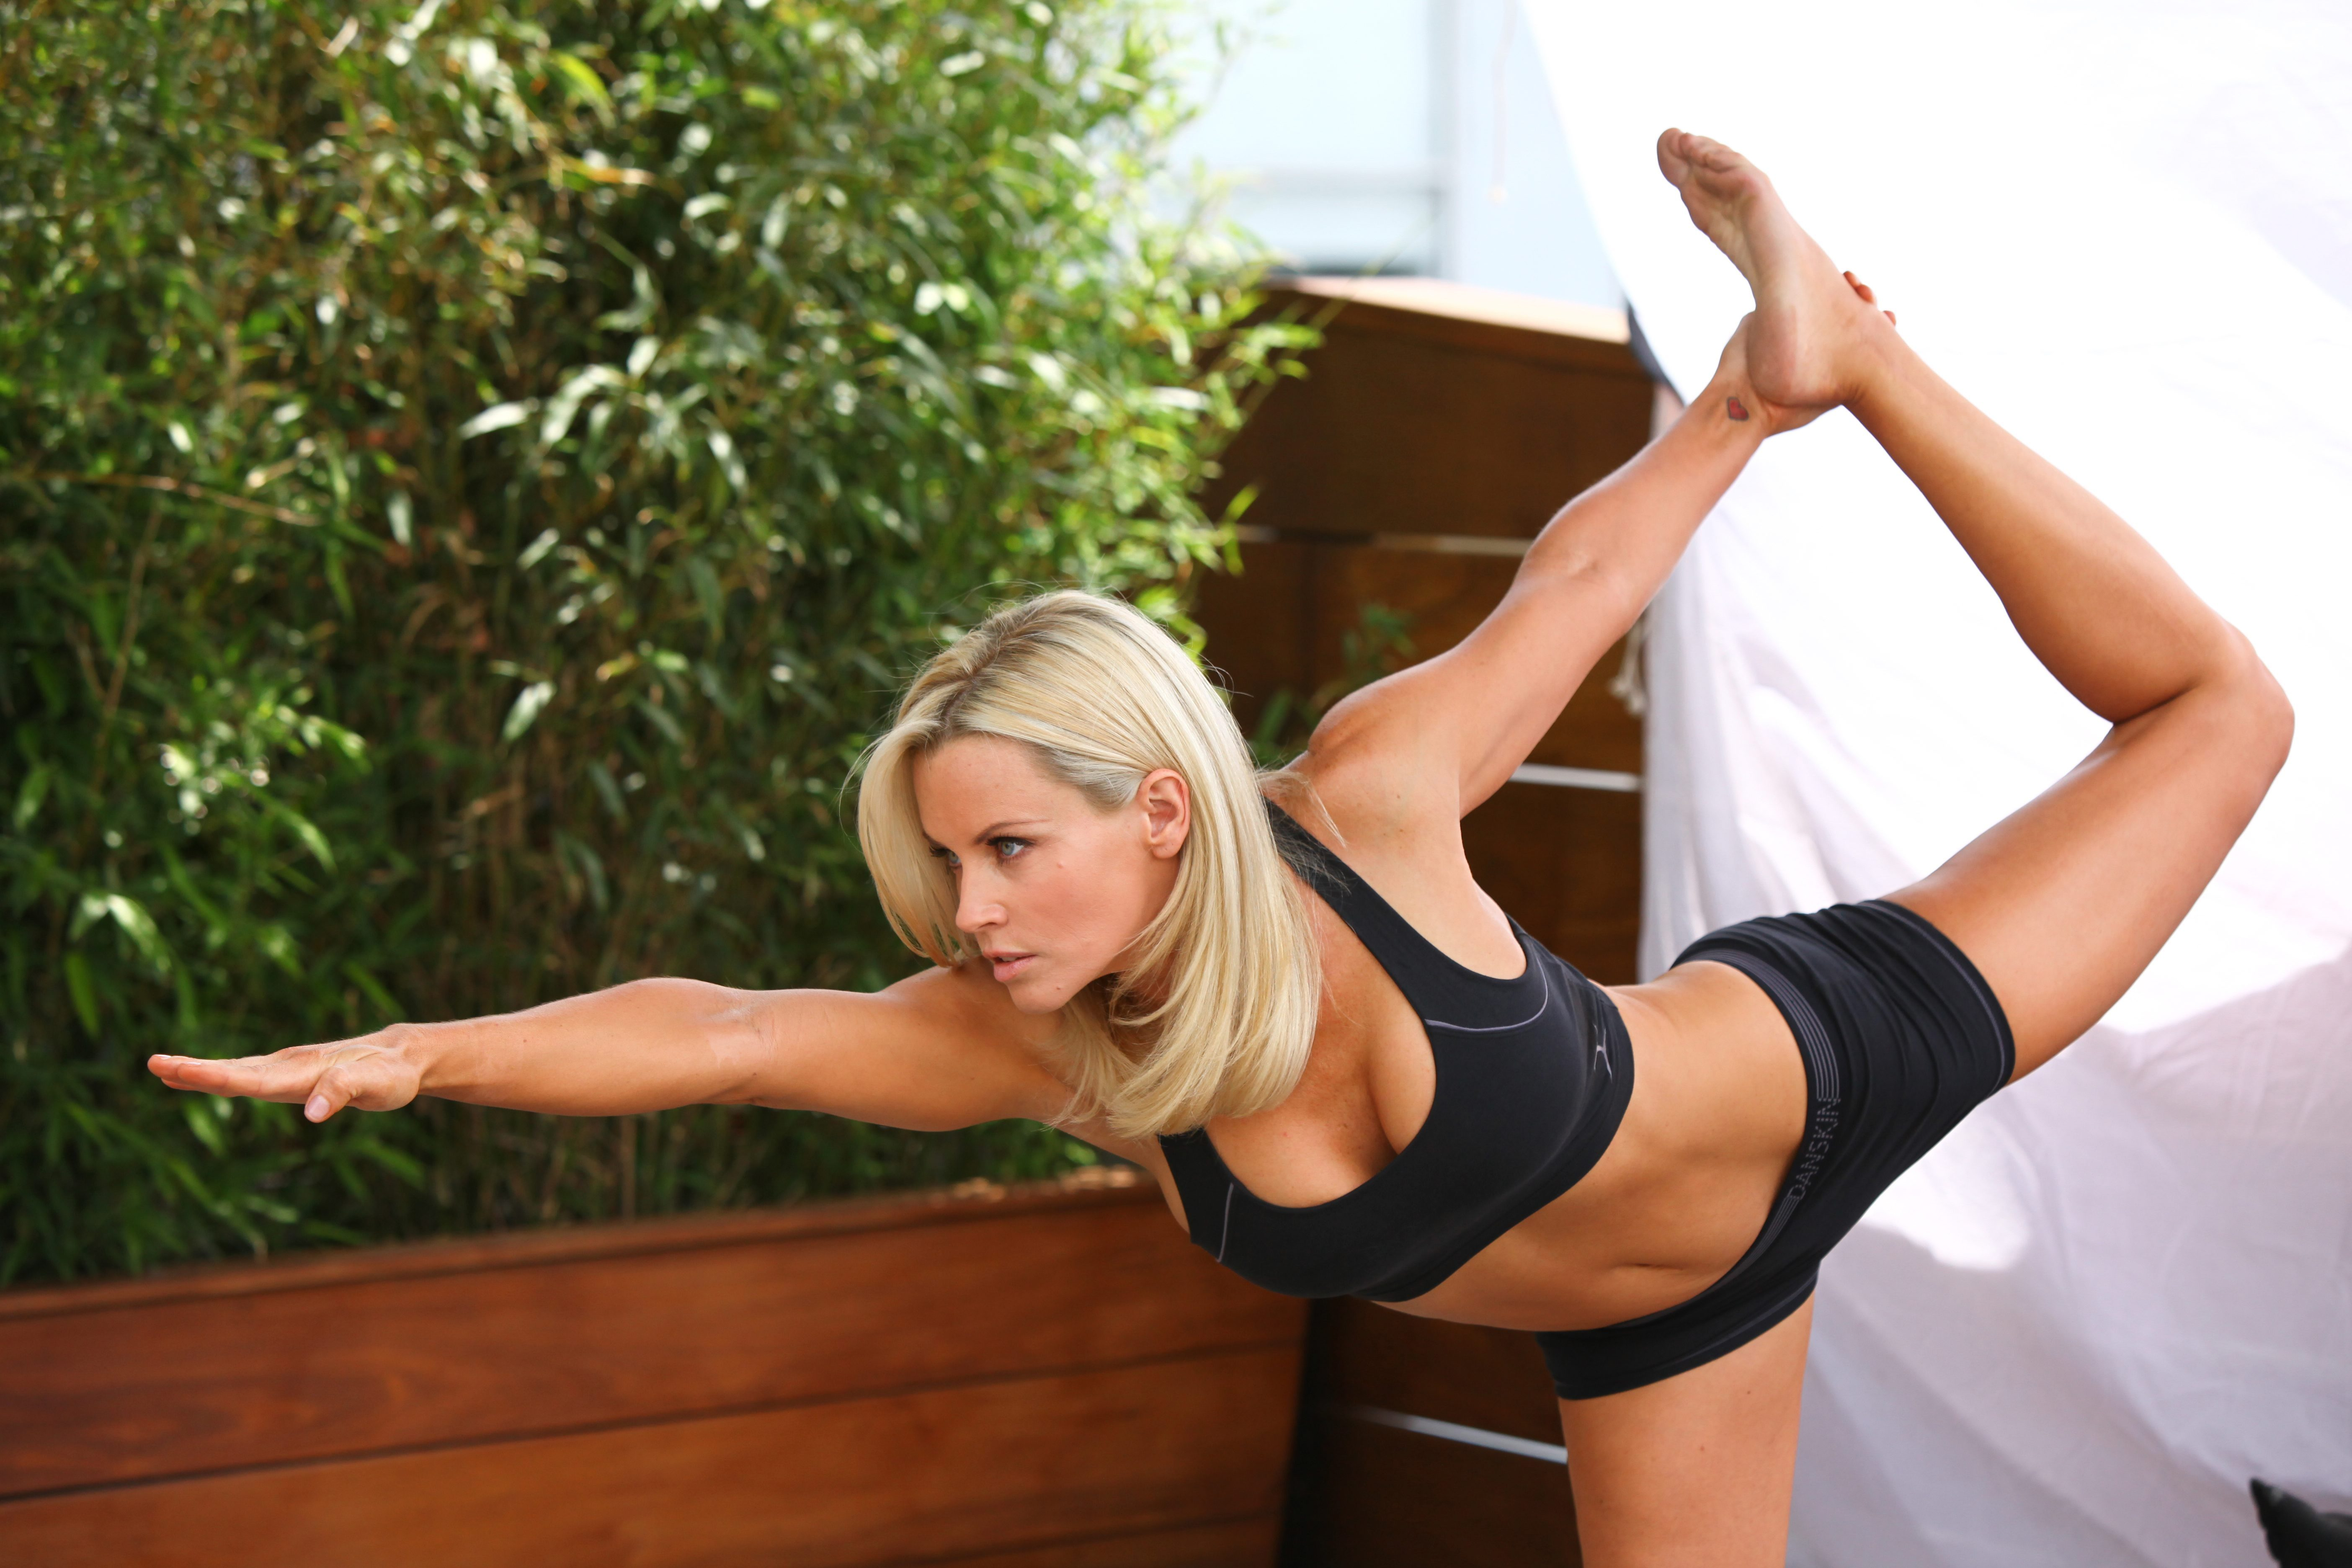 Jenny Mccarthy Super Legs Feet | Dark Brown Hairs